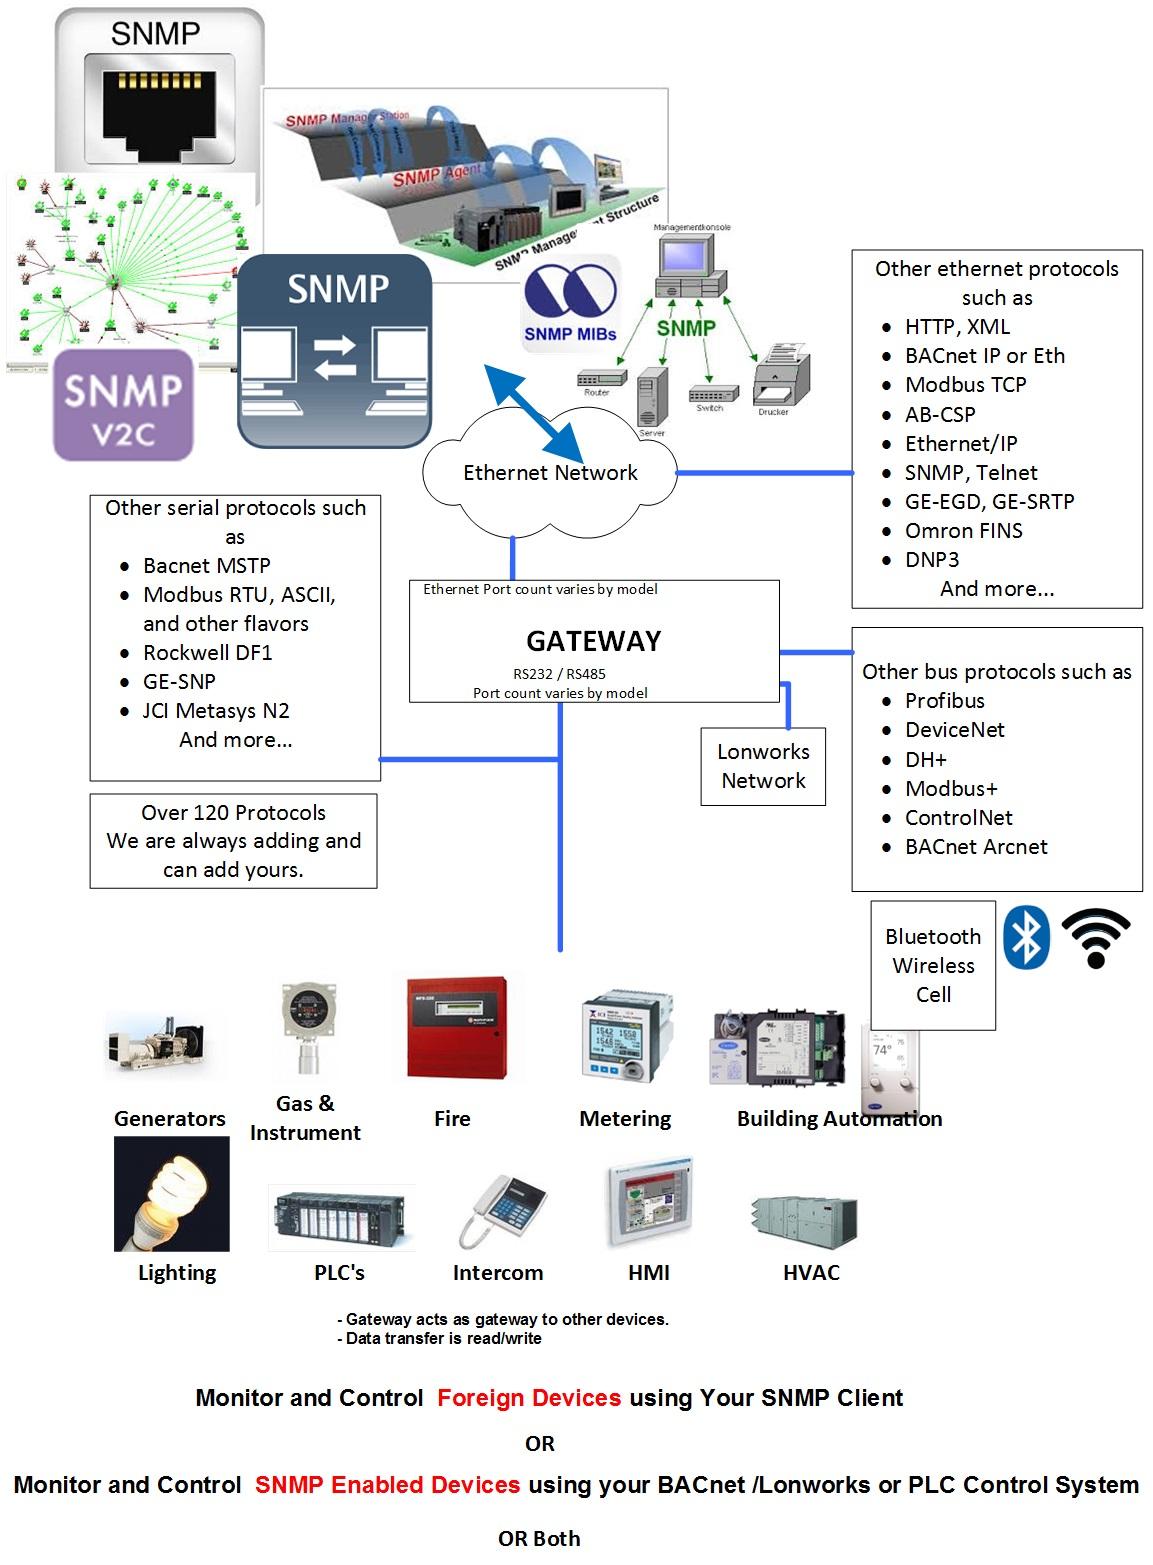 ethernet port wiring diagram snmp wiring diagram sys wiring diagrams  snmp wiring diagram sys wiring diagrams